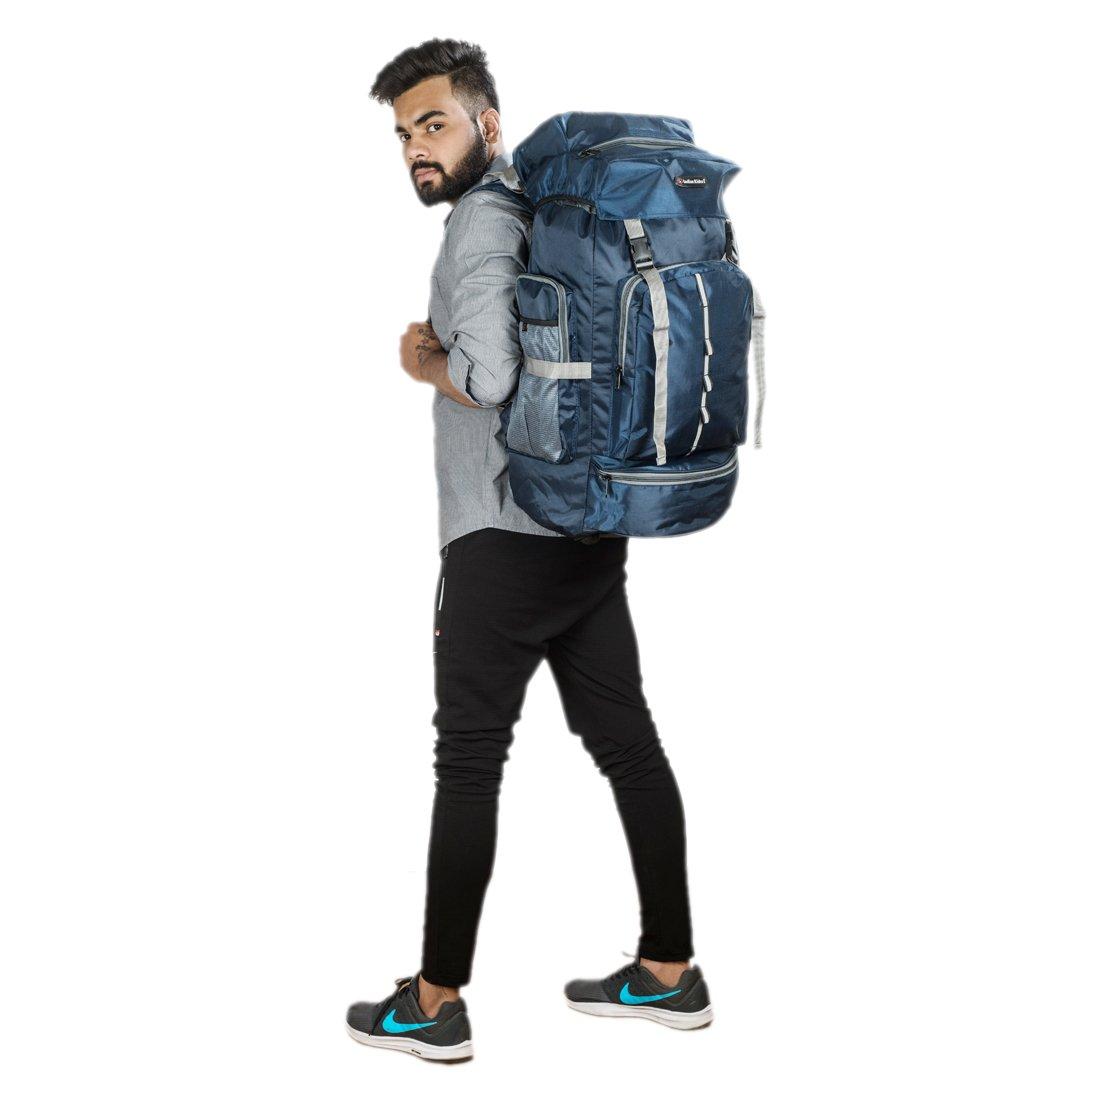 Indian Riders Lightweight Travel Hiking Rucksack Bag Navy Blue- 50 L